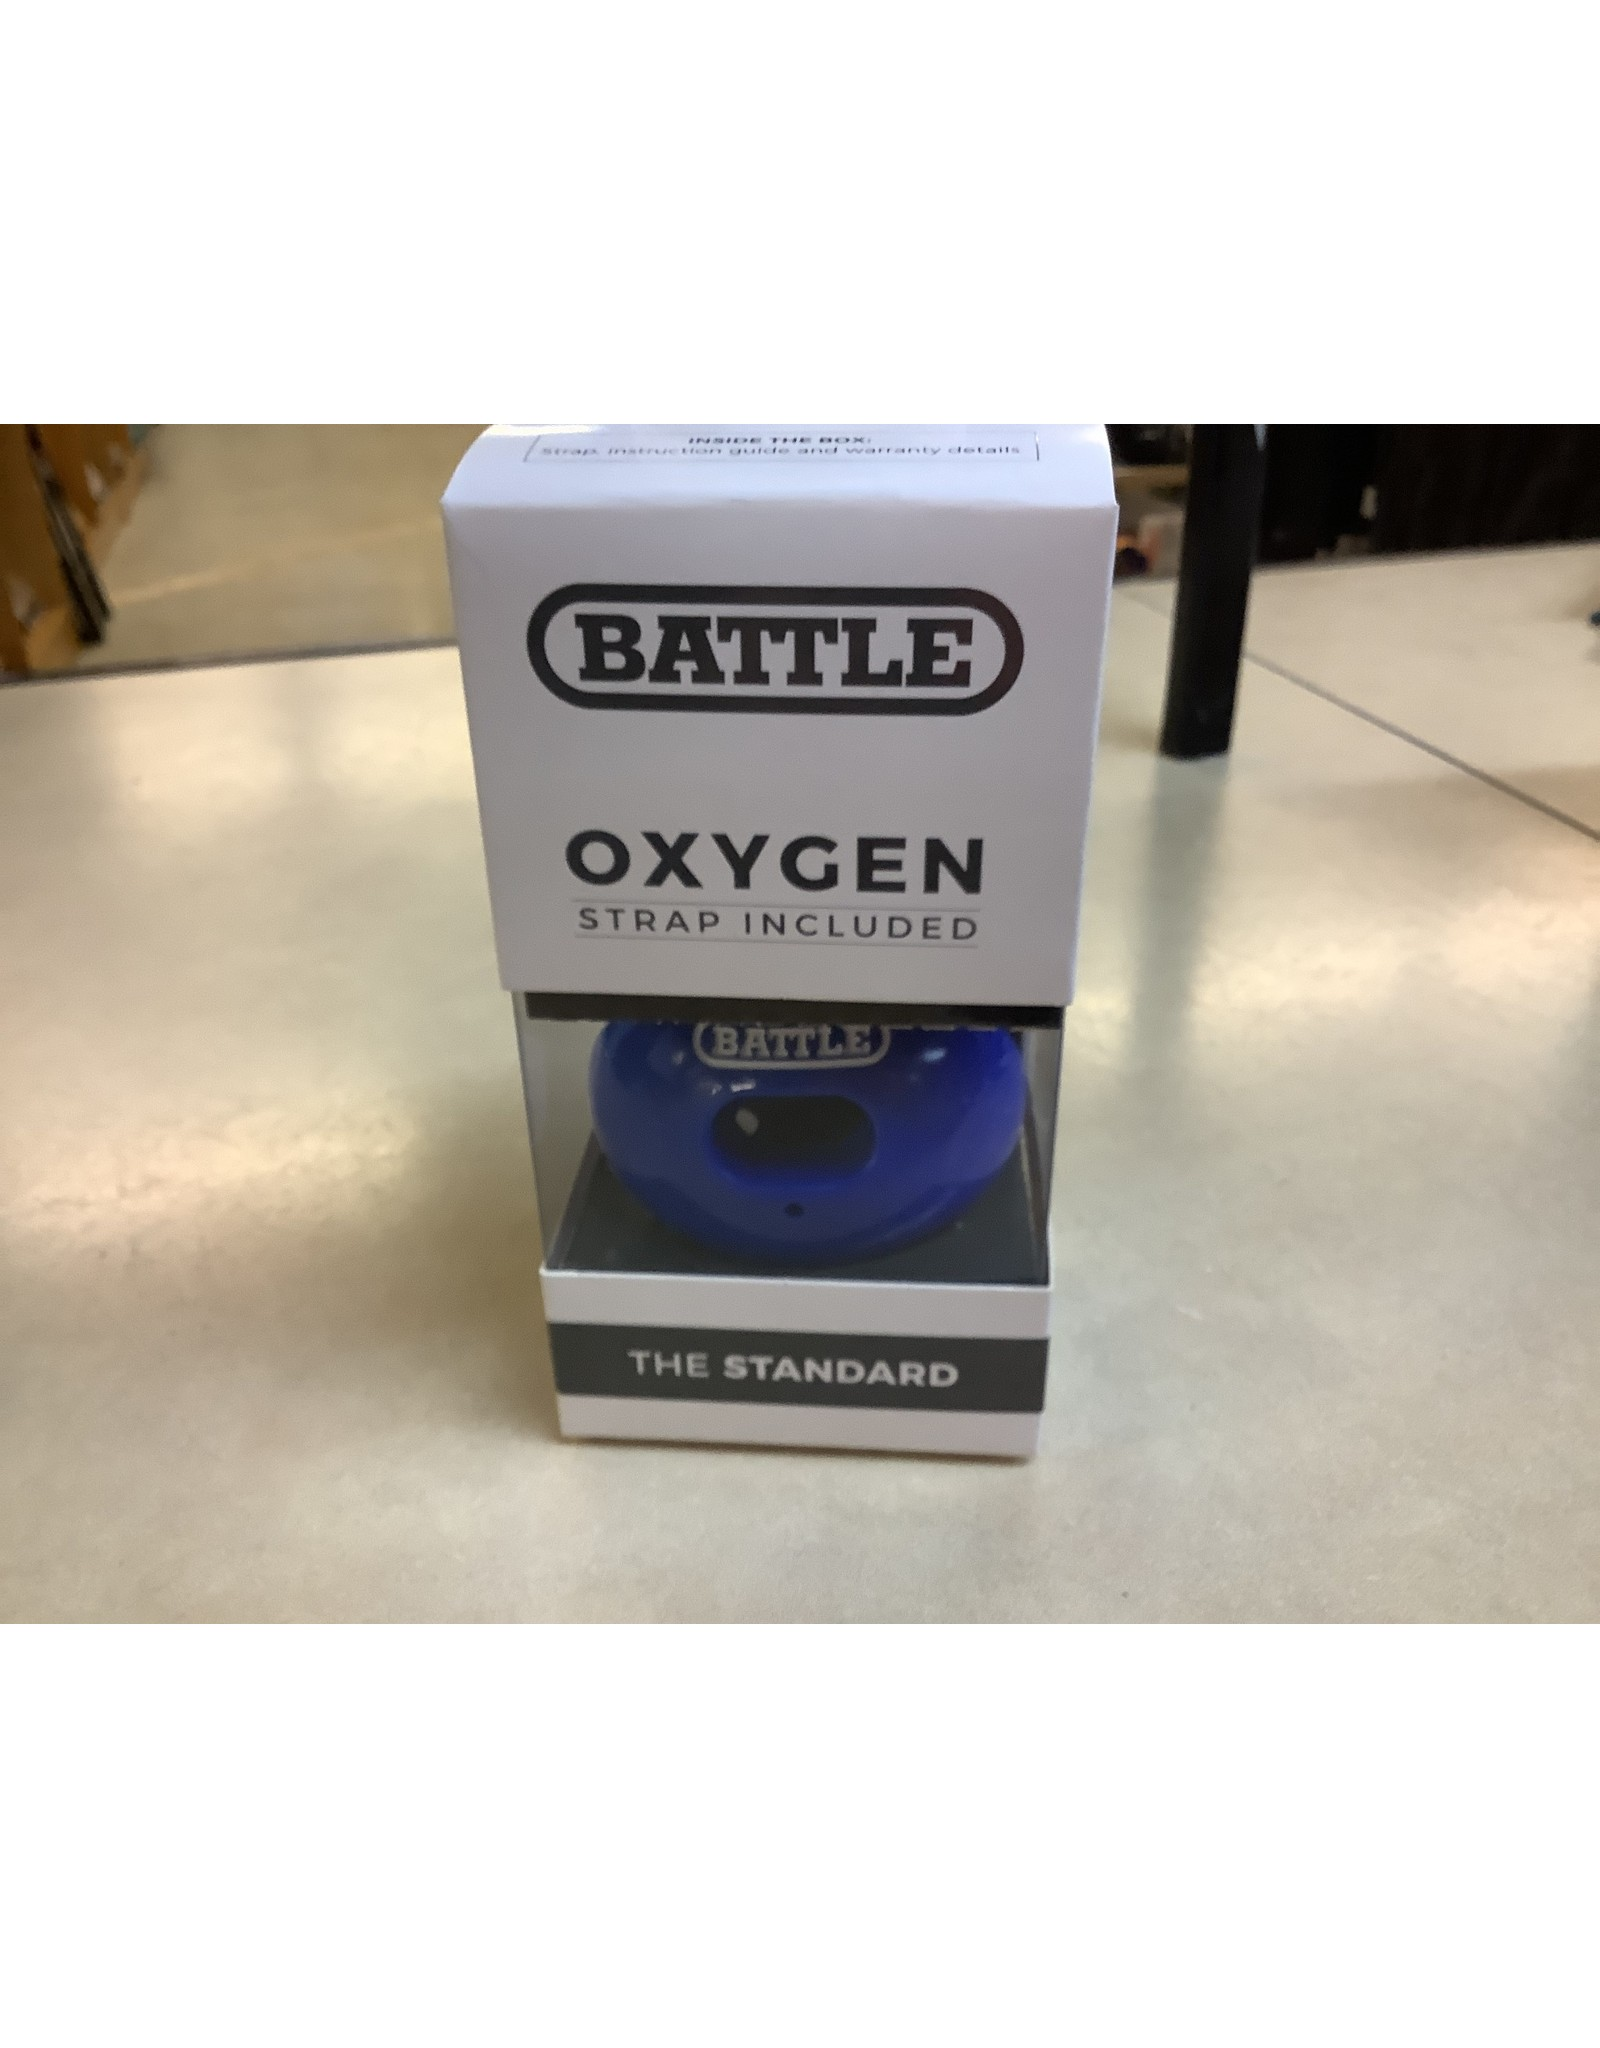 Battle Oxygen Mouthguards